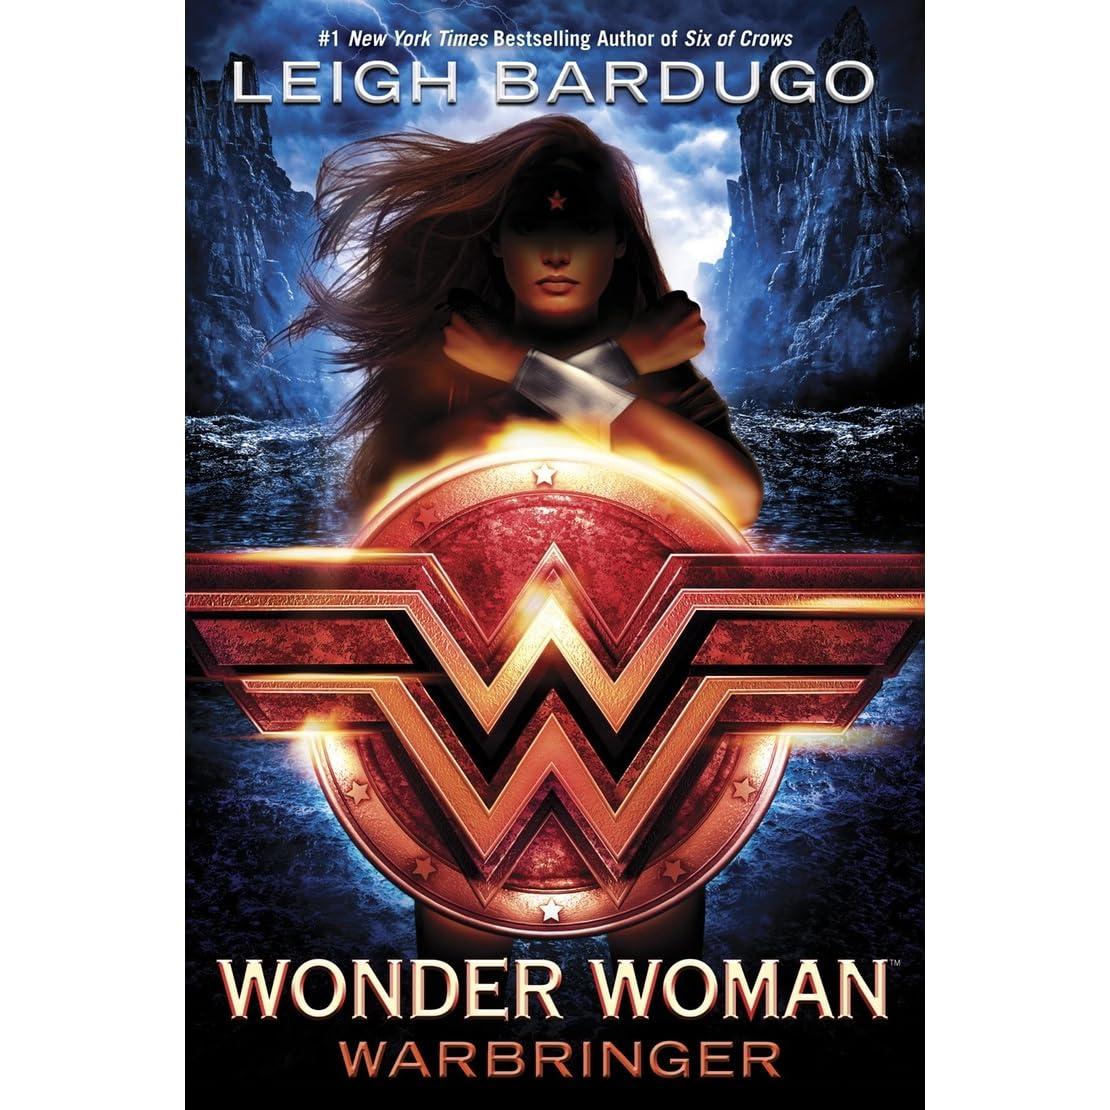 e261e2e21ab7d Wonder Woman: Warbringer (DC Icons, #1) by Leigh Bardugo